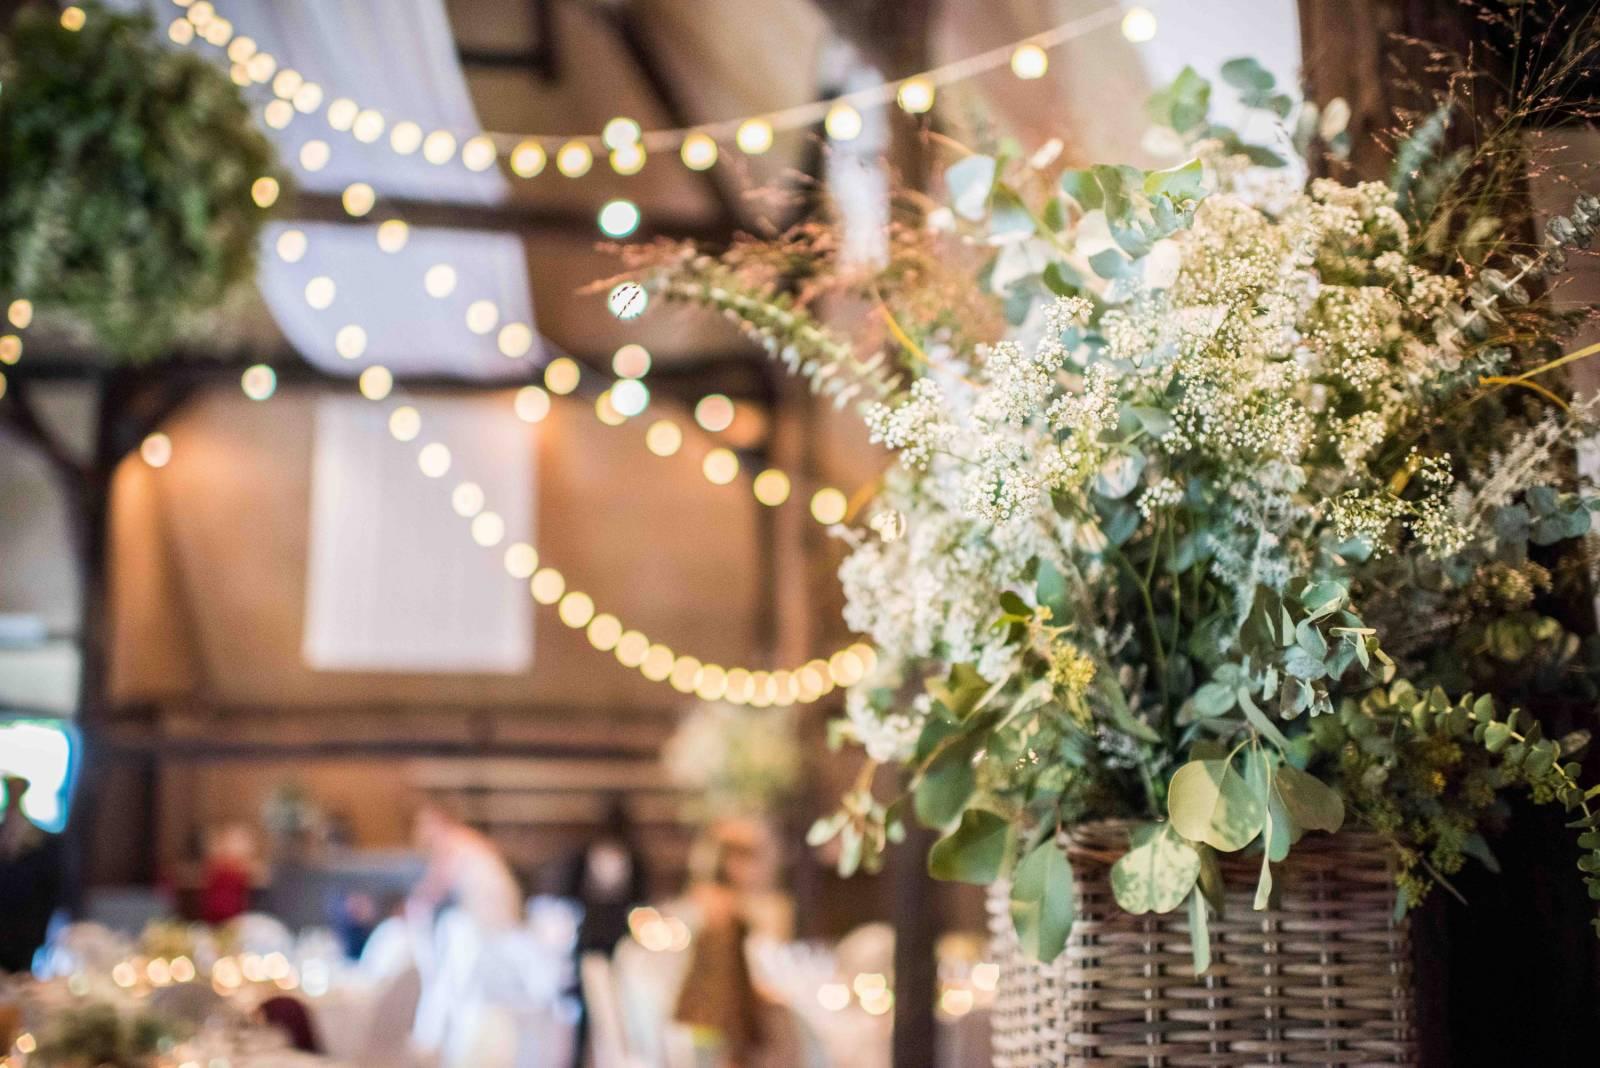 Carpe Diem Bloemen & Decoratie - House of Weddings  - 22